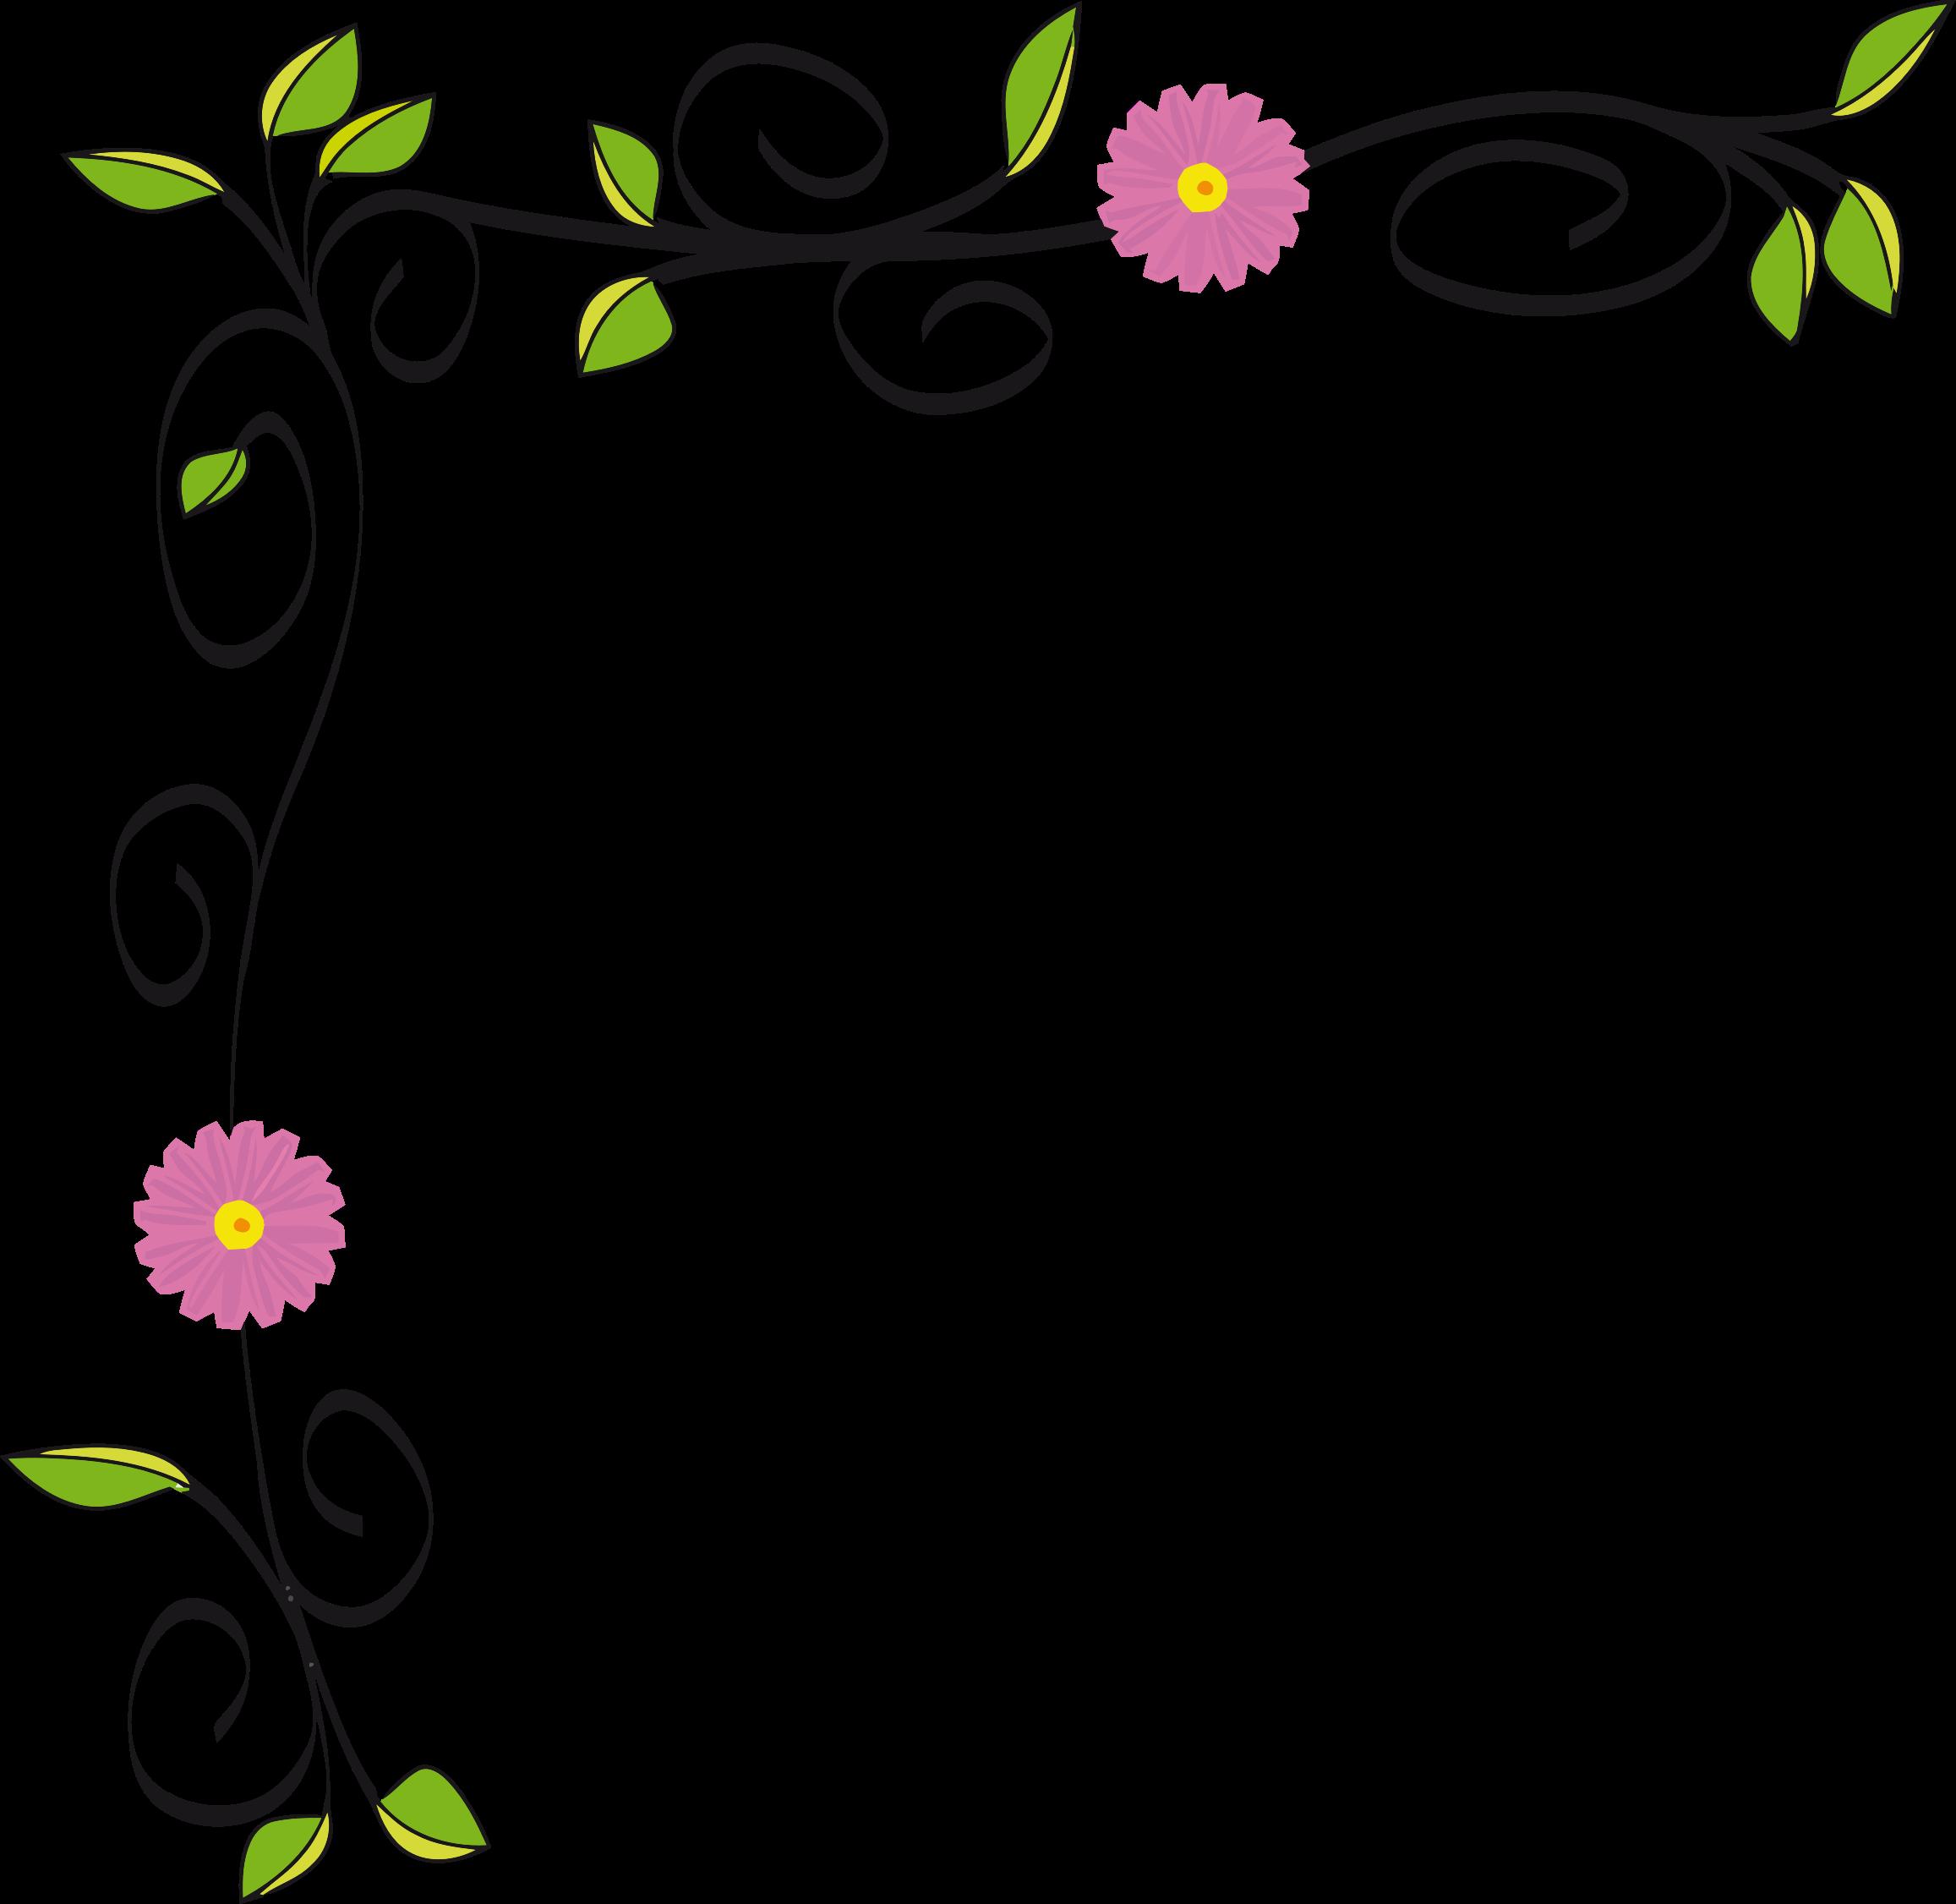 Floral border vectorized.